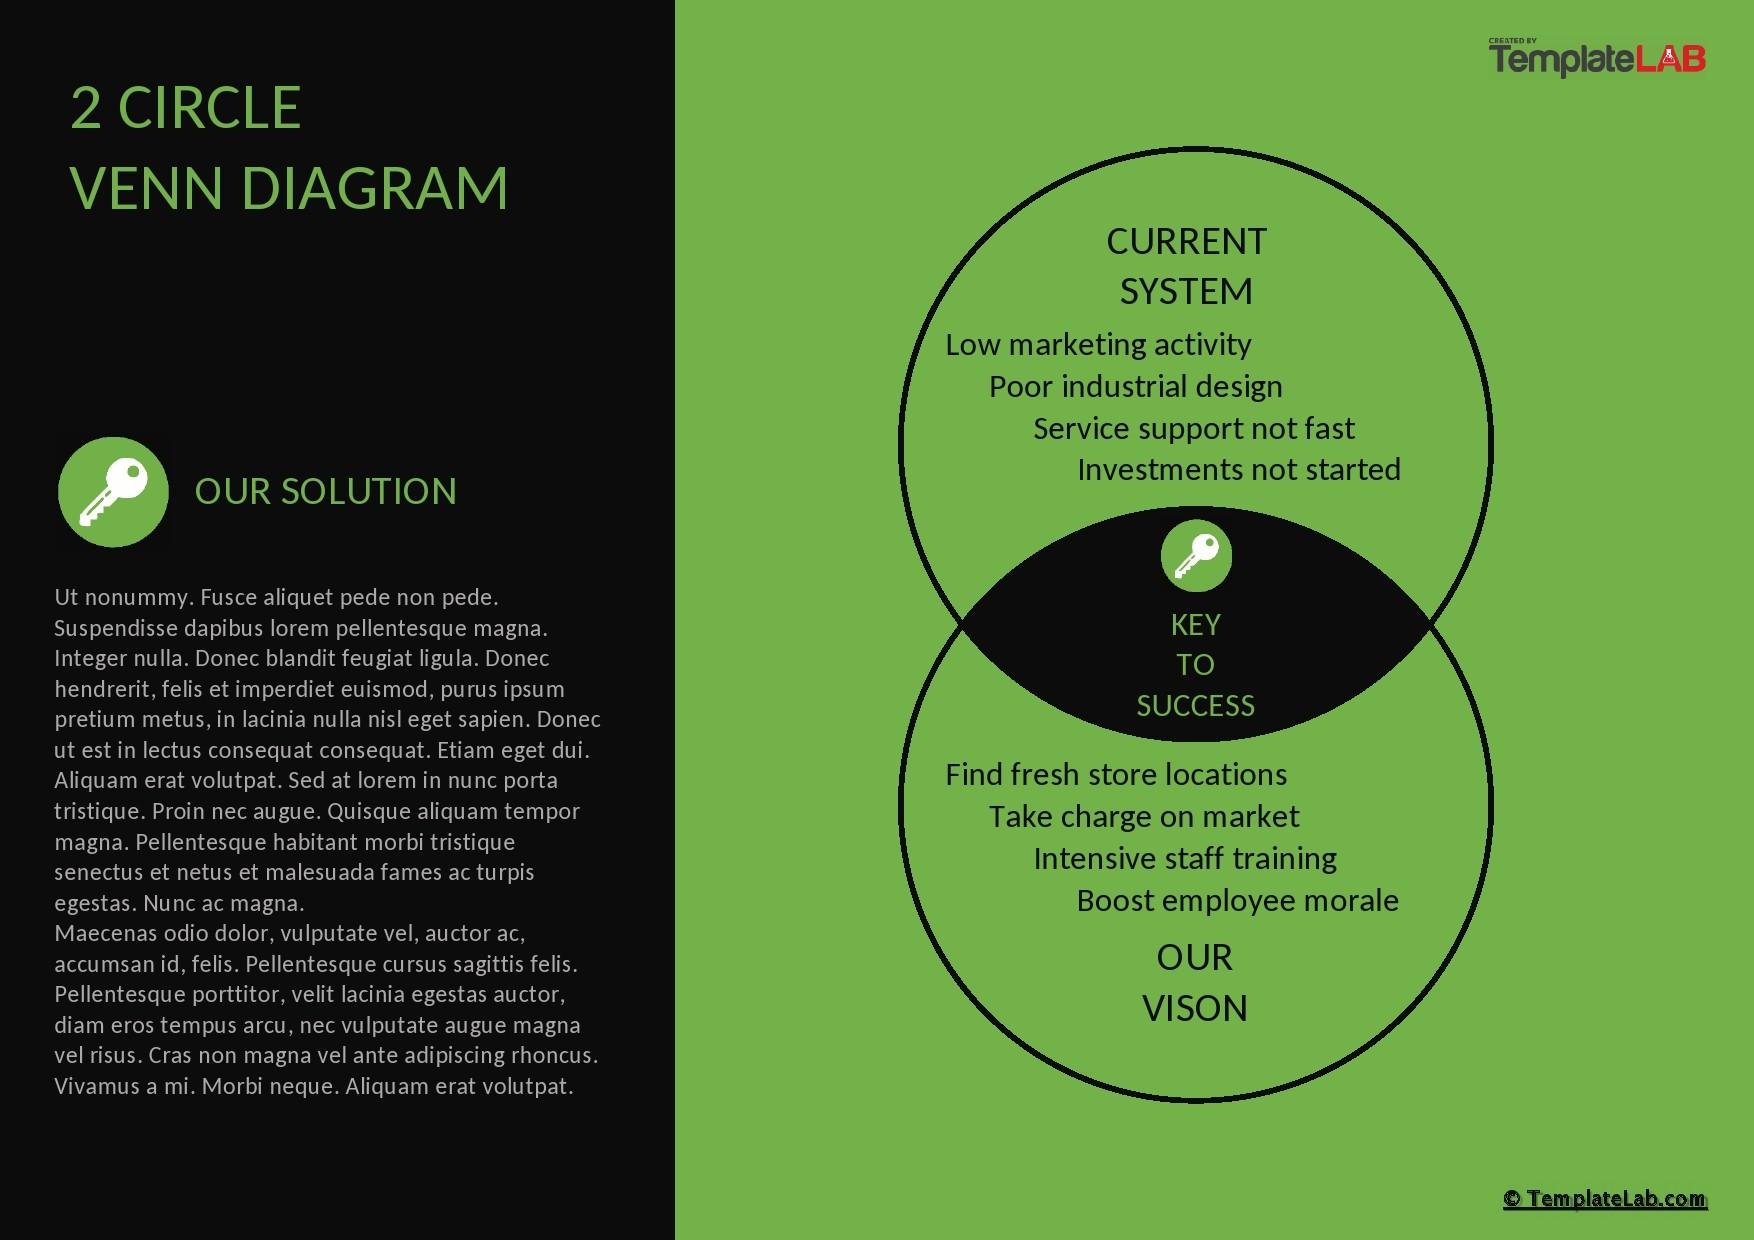 Free 2 Circle Venn Diagram Template 02 - TemplateLab.com